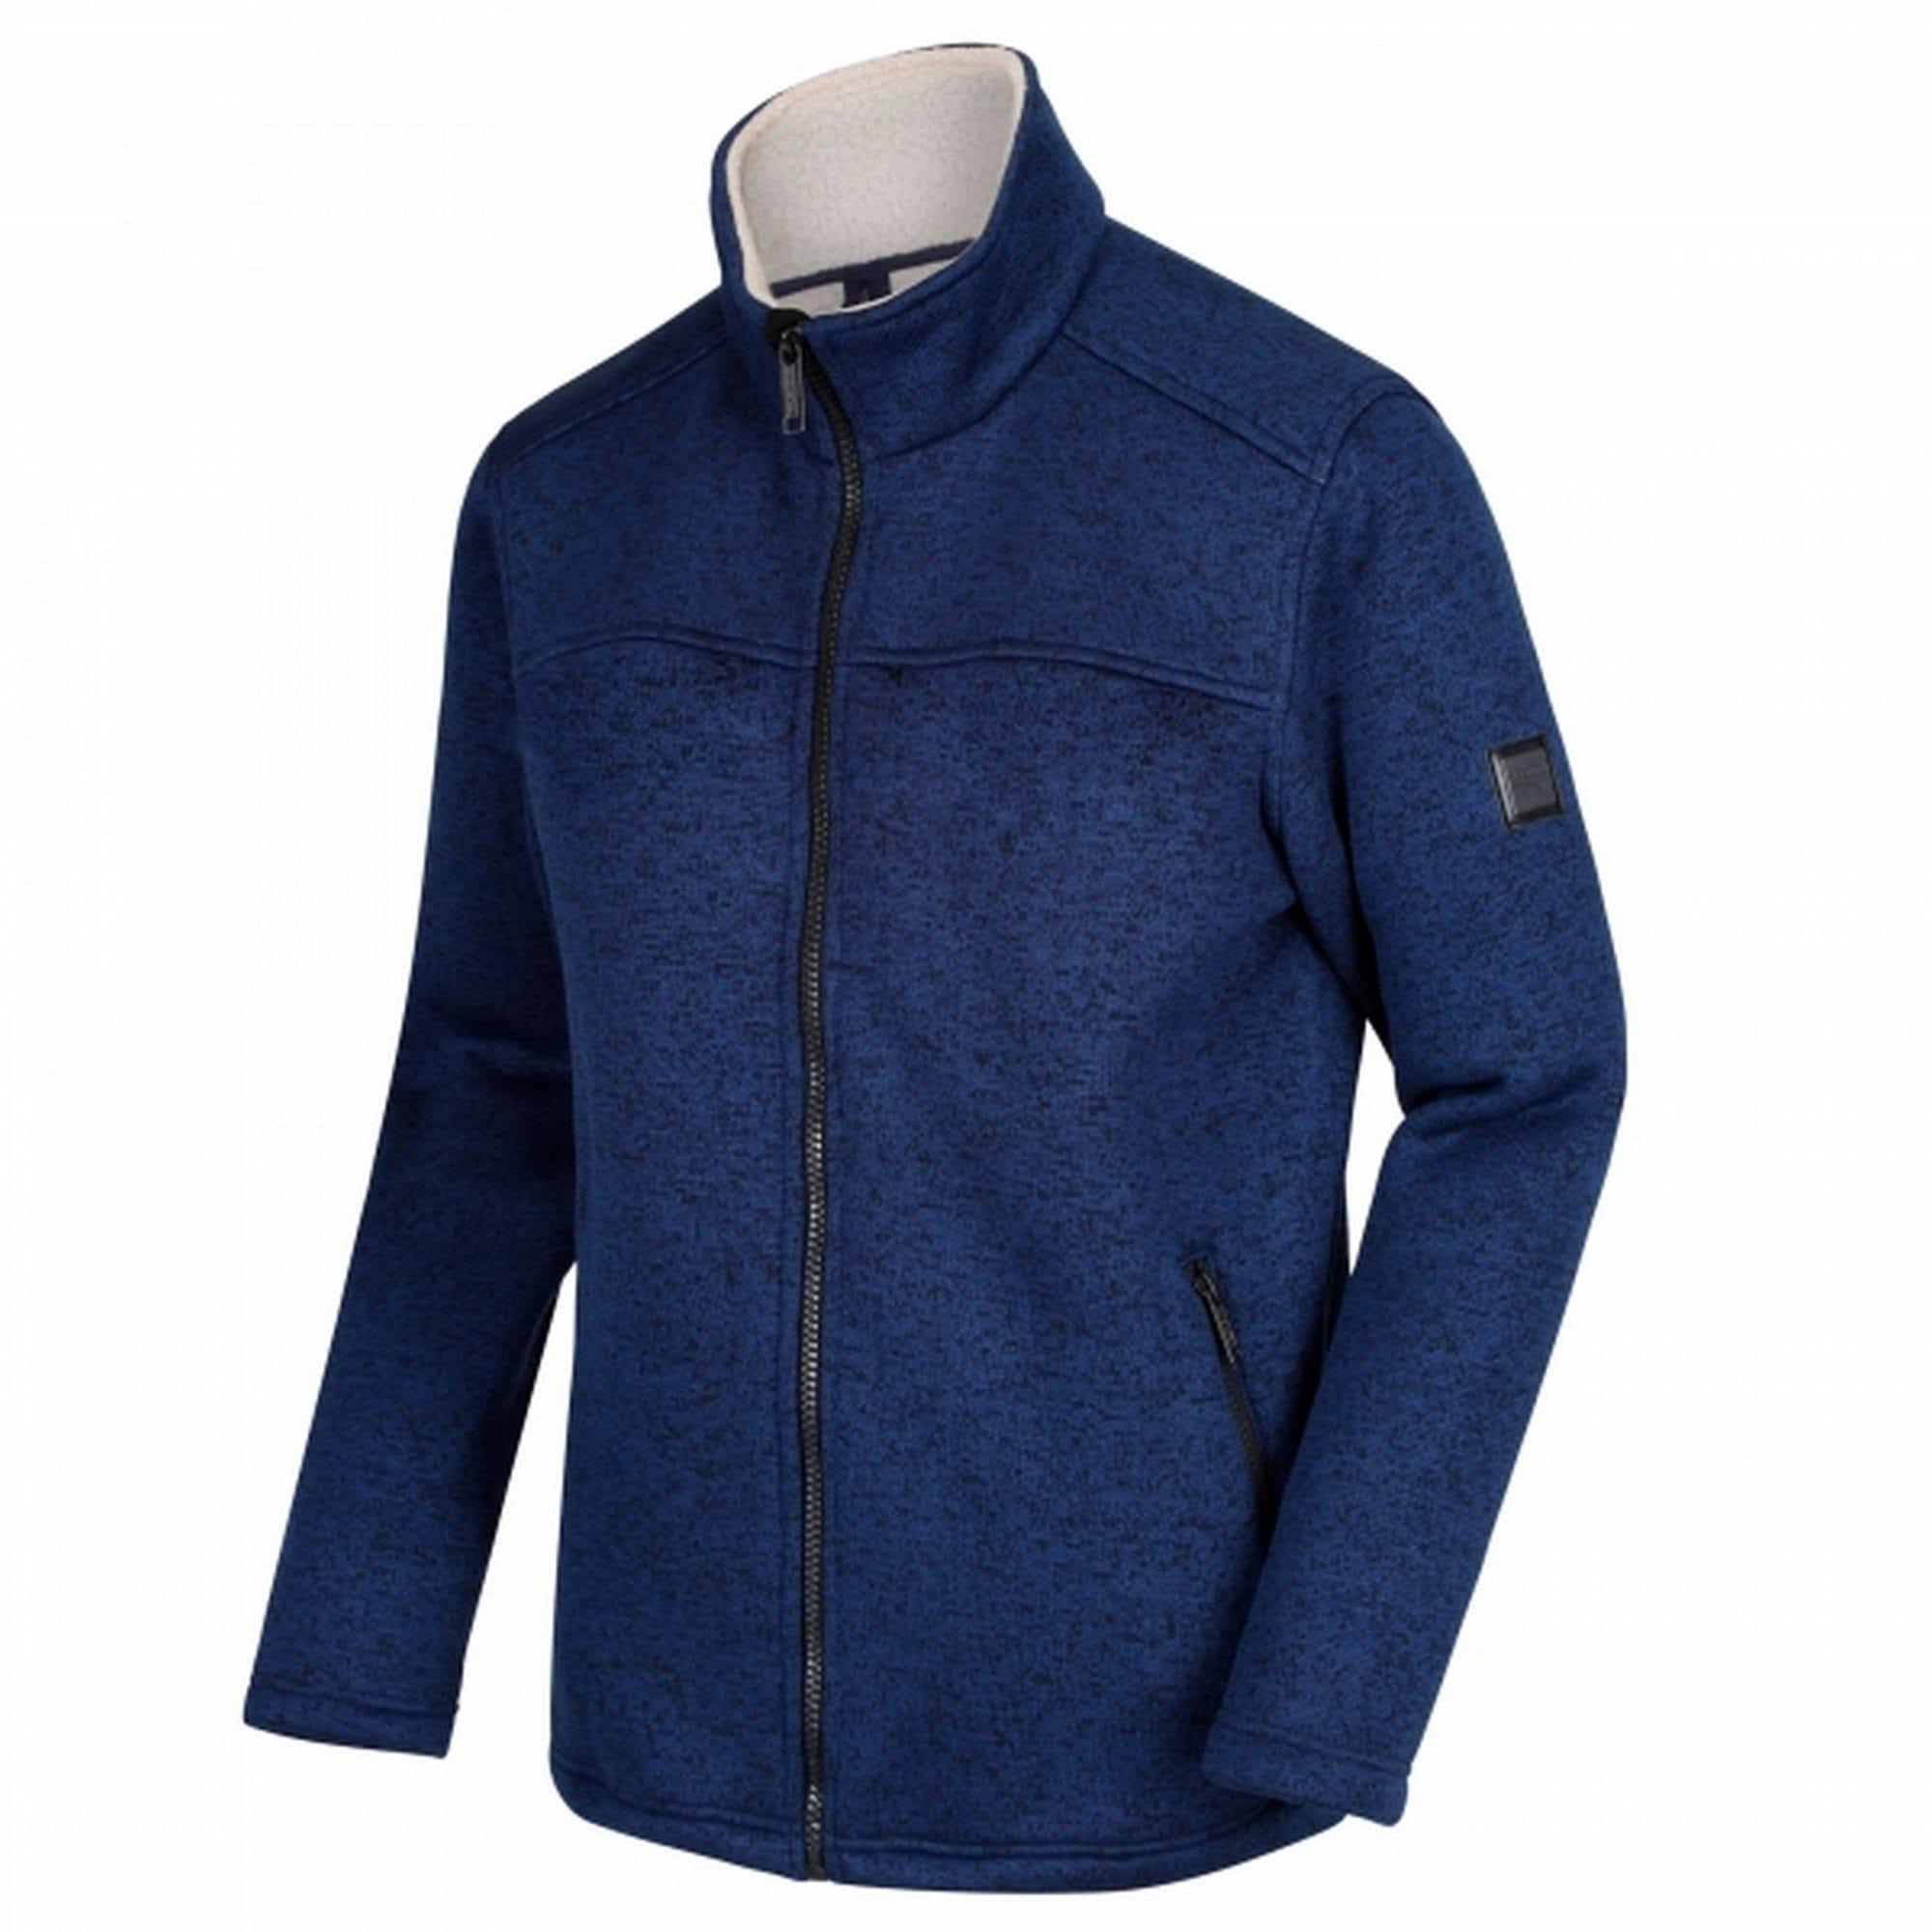 Regatta Outdoorjacke | Sportbekleidung > Sportjacken > Outdoorjacken | Schwarz | Polyester - Fleece | Regatta